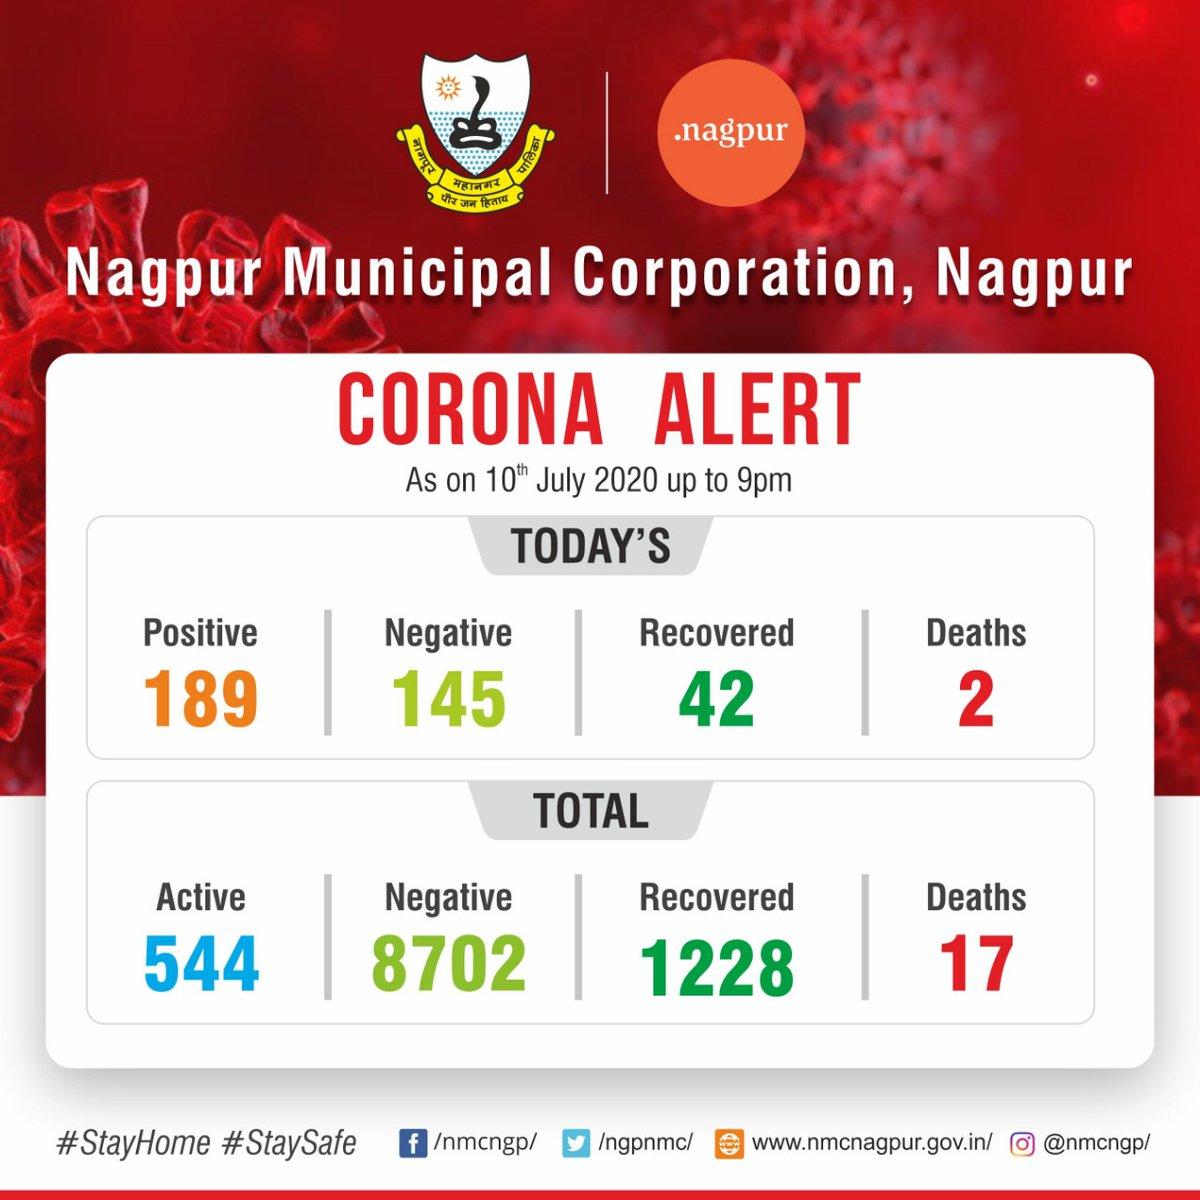 https://t.co/0uf1KfMjPL NMC #Covid_19 alert: zone-wise status update of the COVID19 cases as on 10 July 2020 #CoronaUpdatesInIndia #WarAgainstVirus #IndiaFightsCoronavirus https://t.co/kd4kzMNA5r